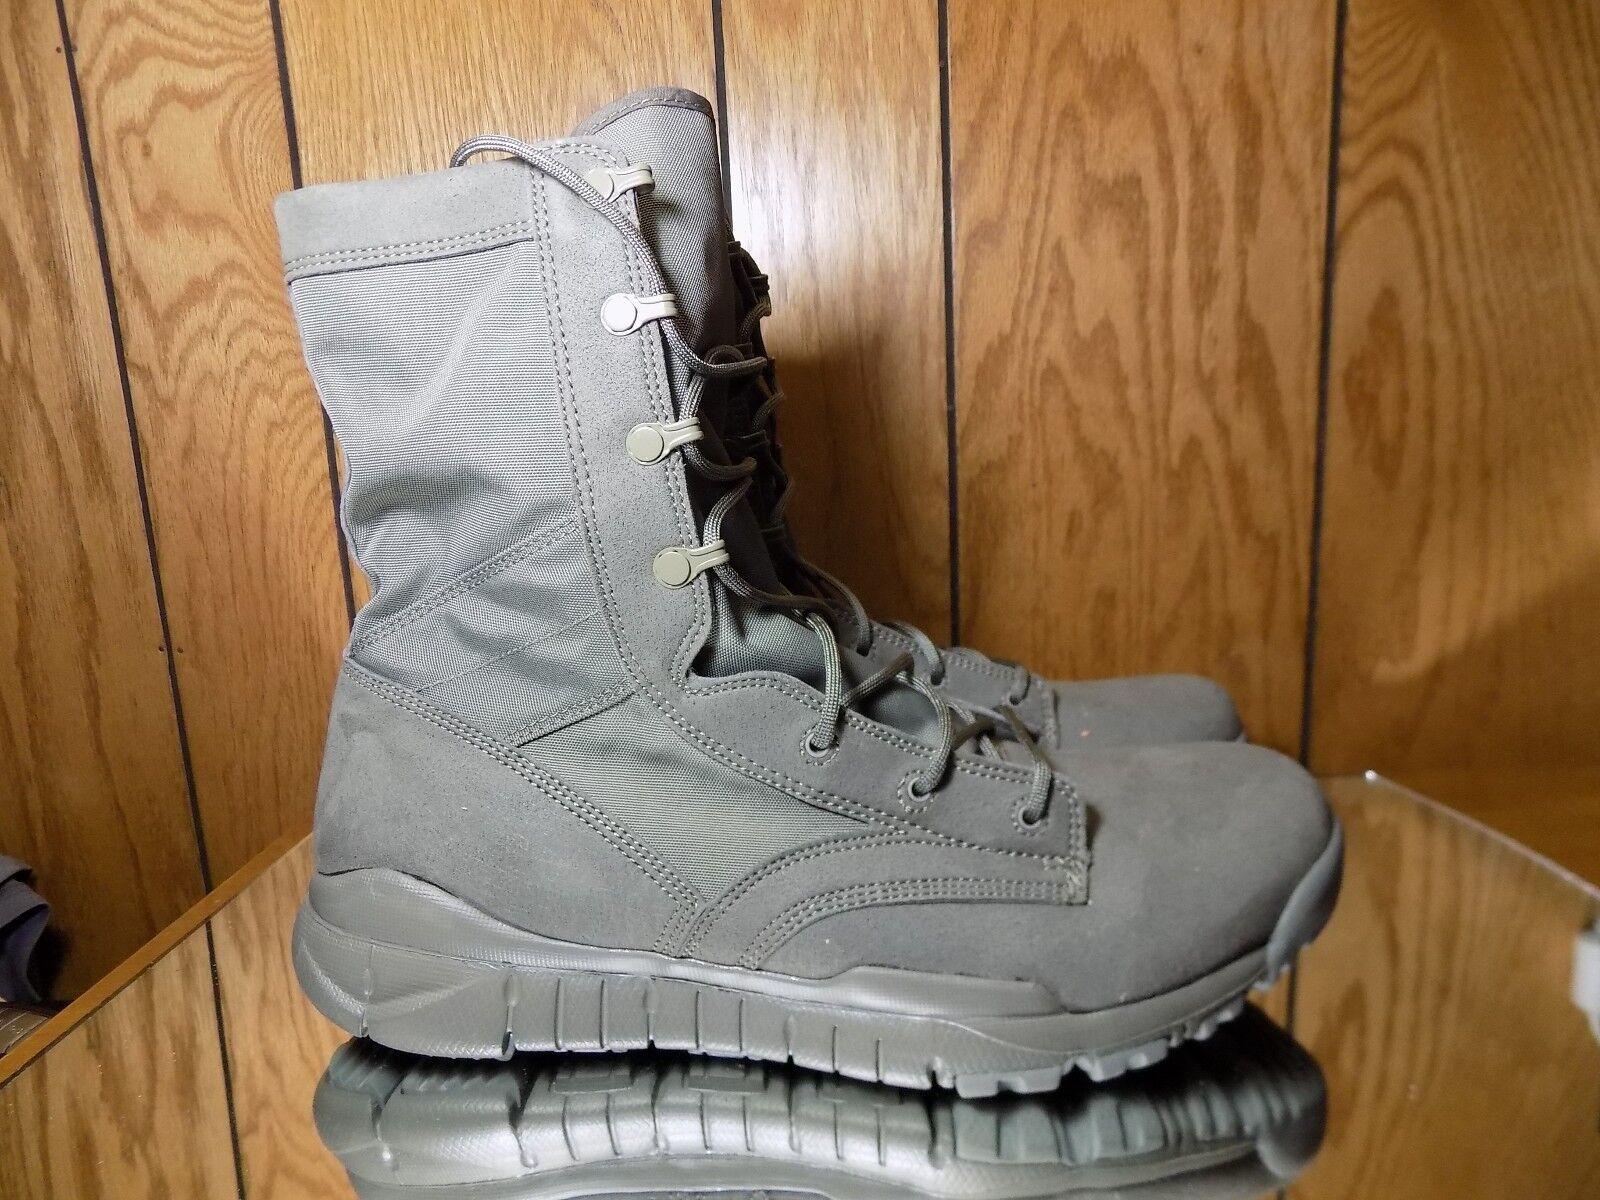 Mens Nike SFB 329798-200 Sage Sage Brand New Size 12